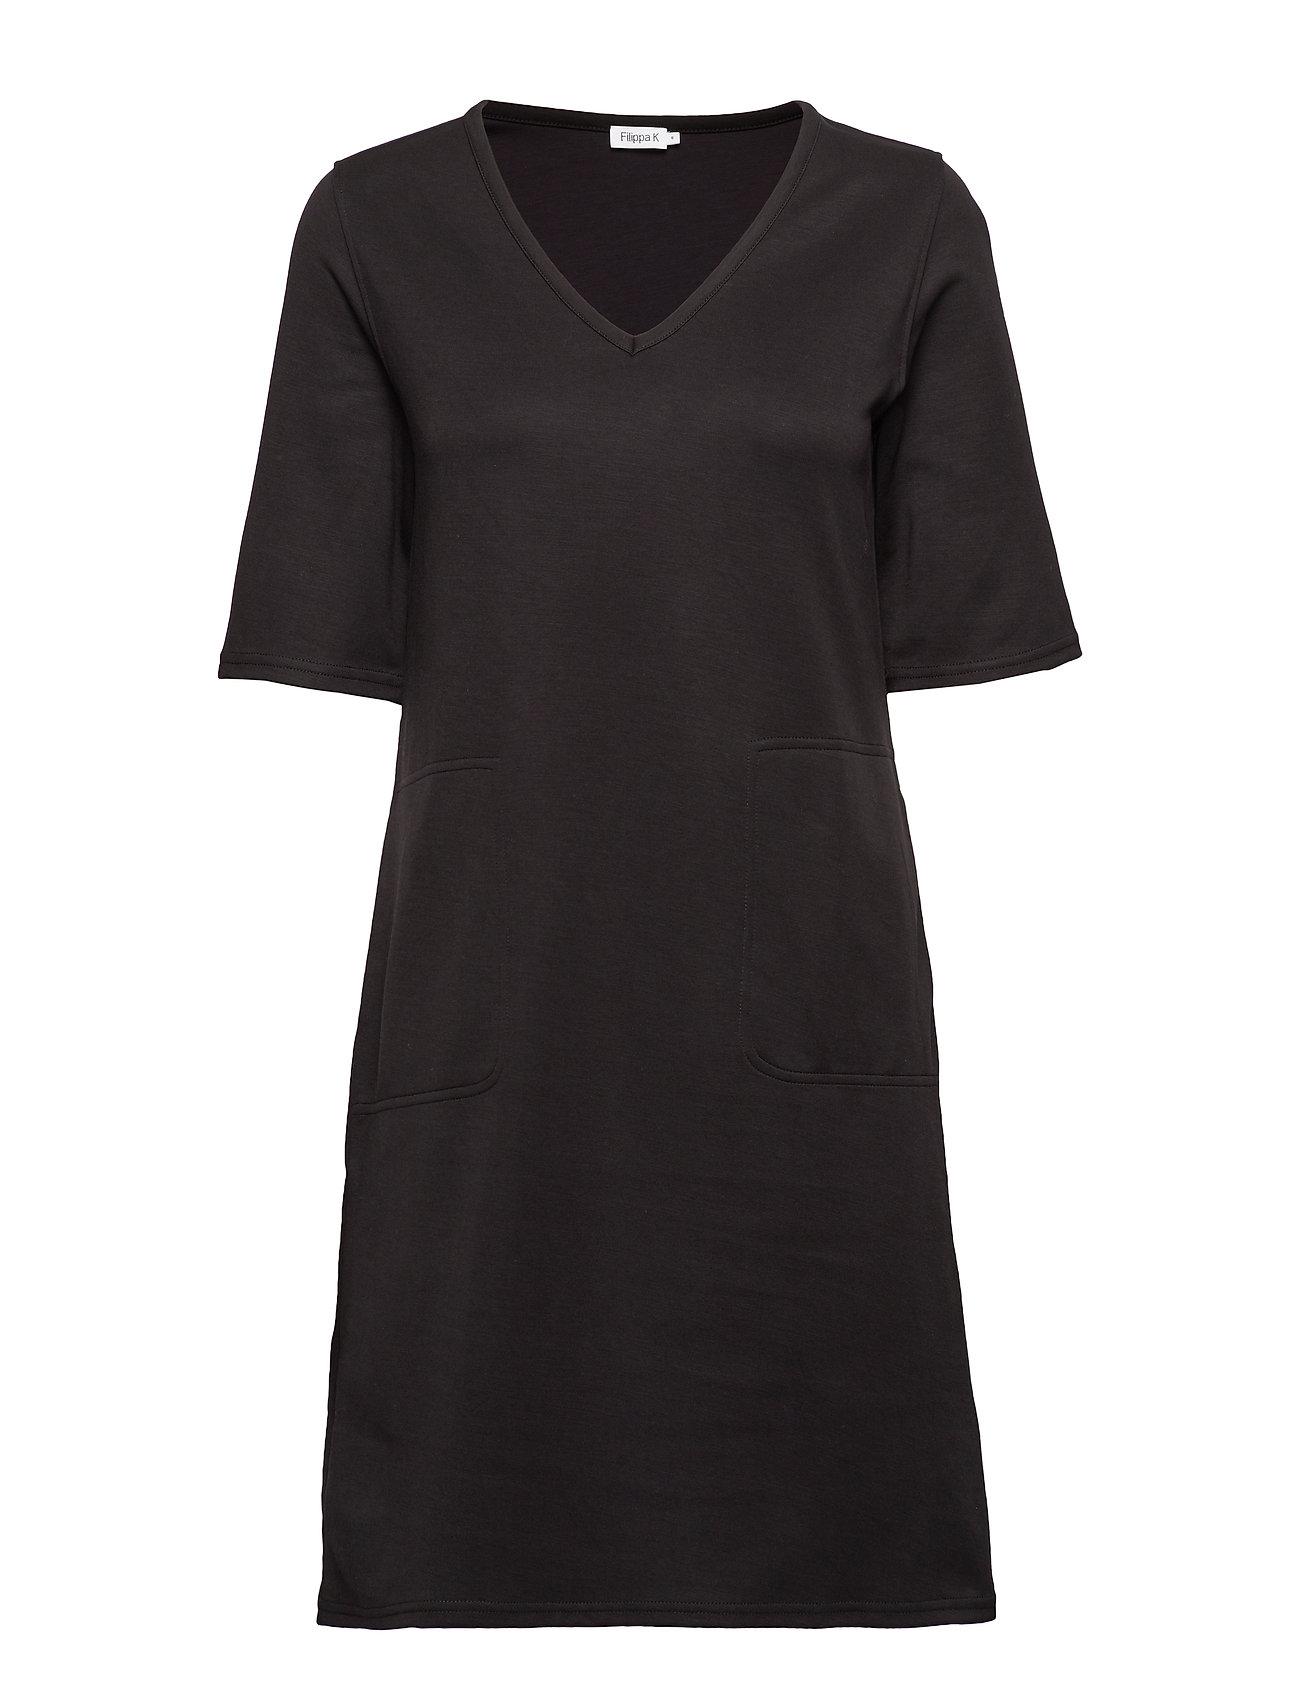 Filippa K Double face T-shirt Dress - BLACK